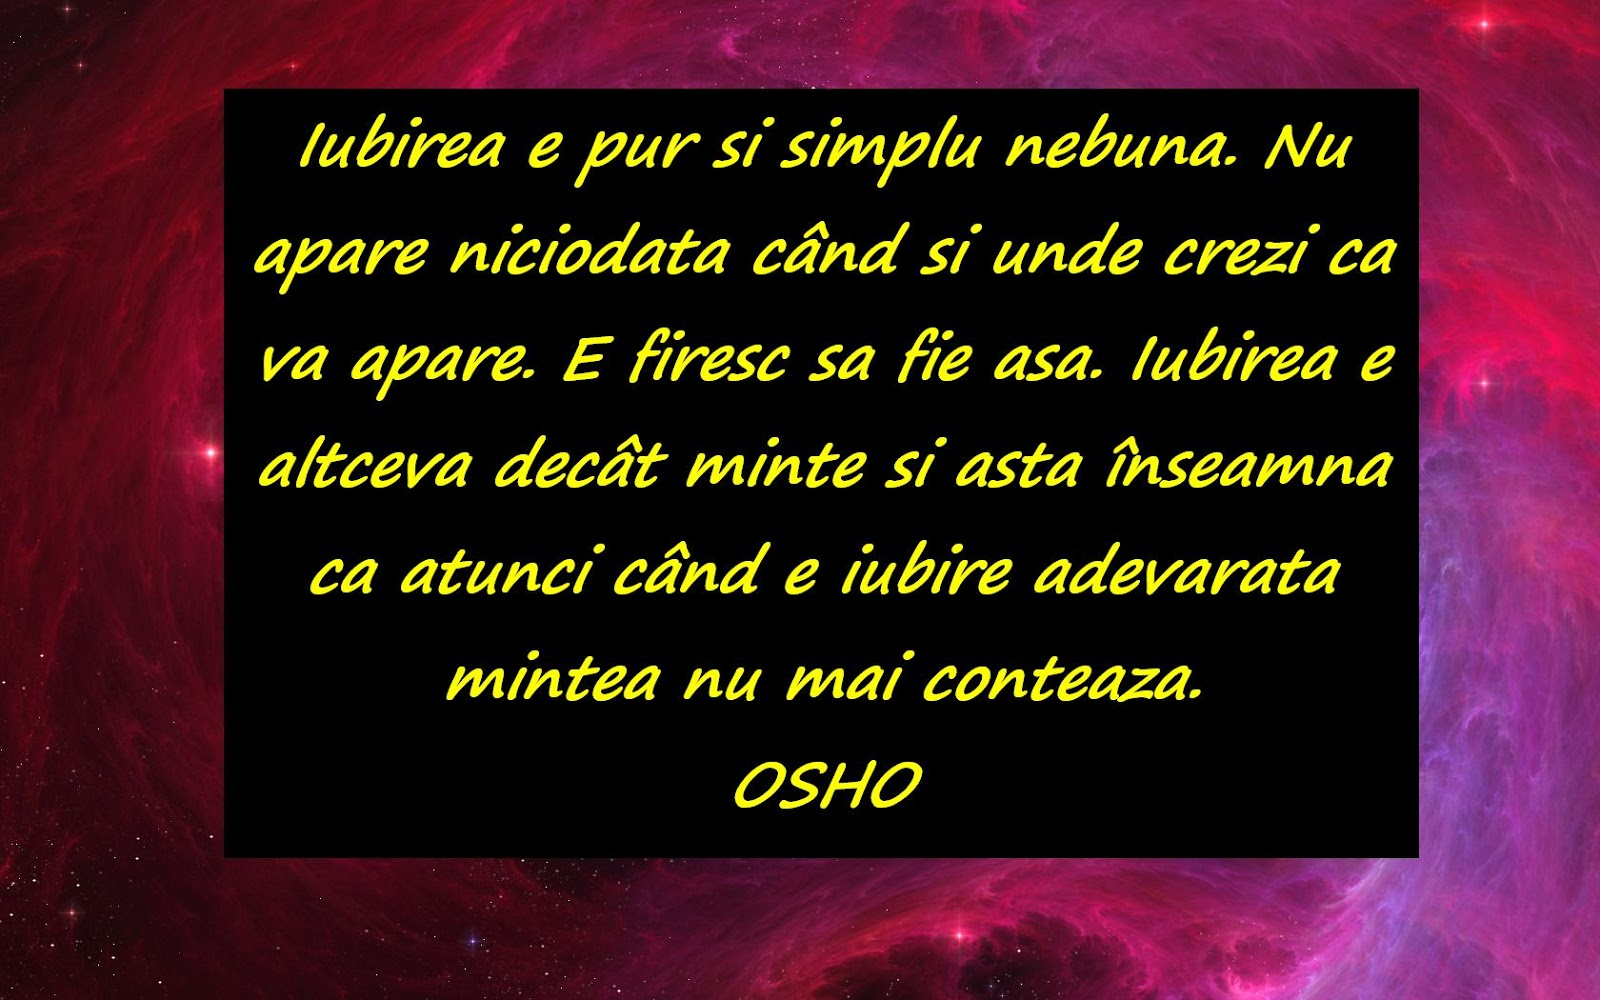 osho citate despre iubire VORBE SI PROVERBE DIN TOATA LUMEA: iubirea in citate la Osho osho citate despre iubire